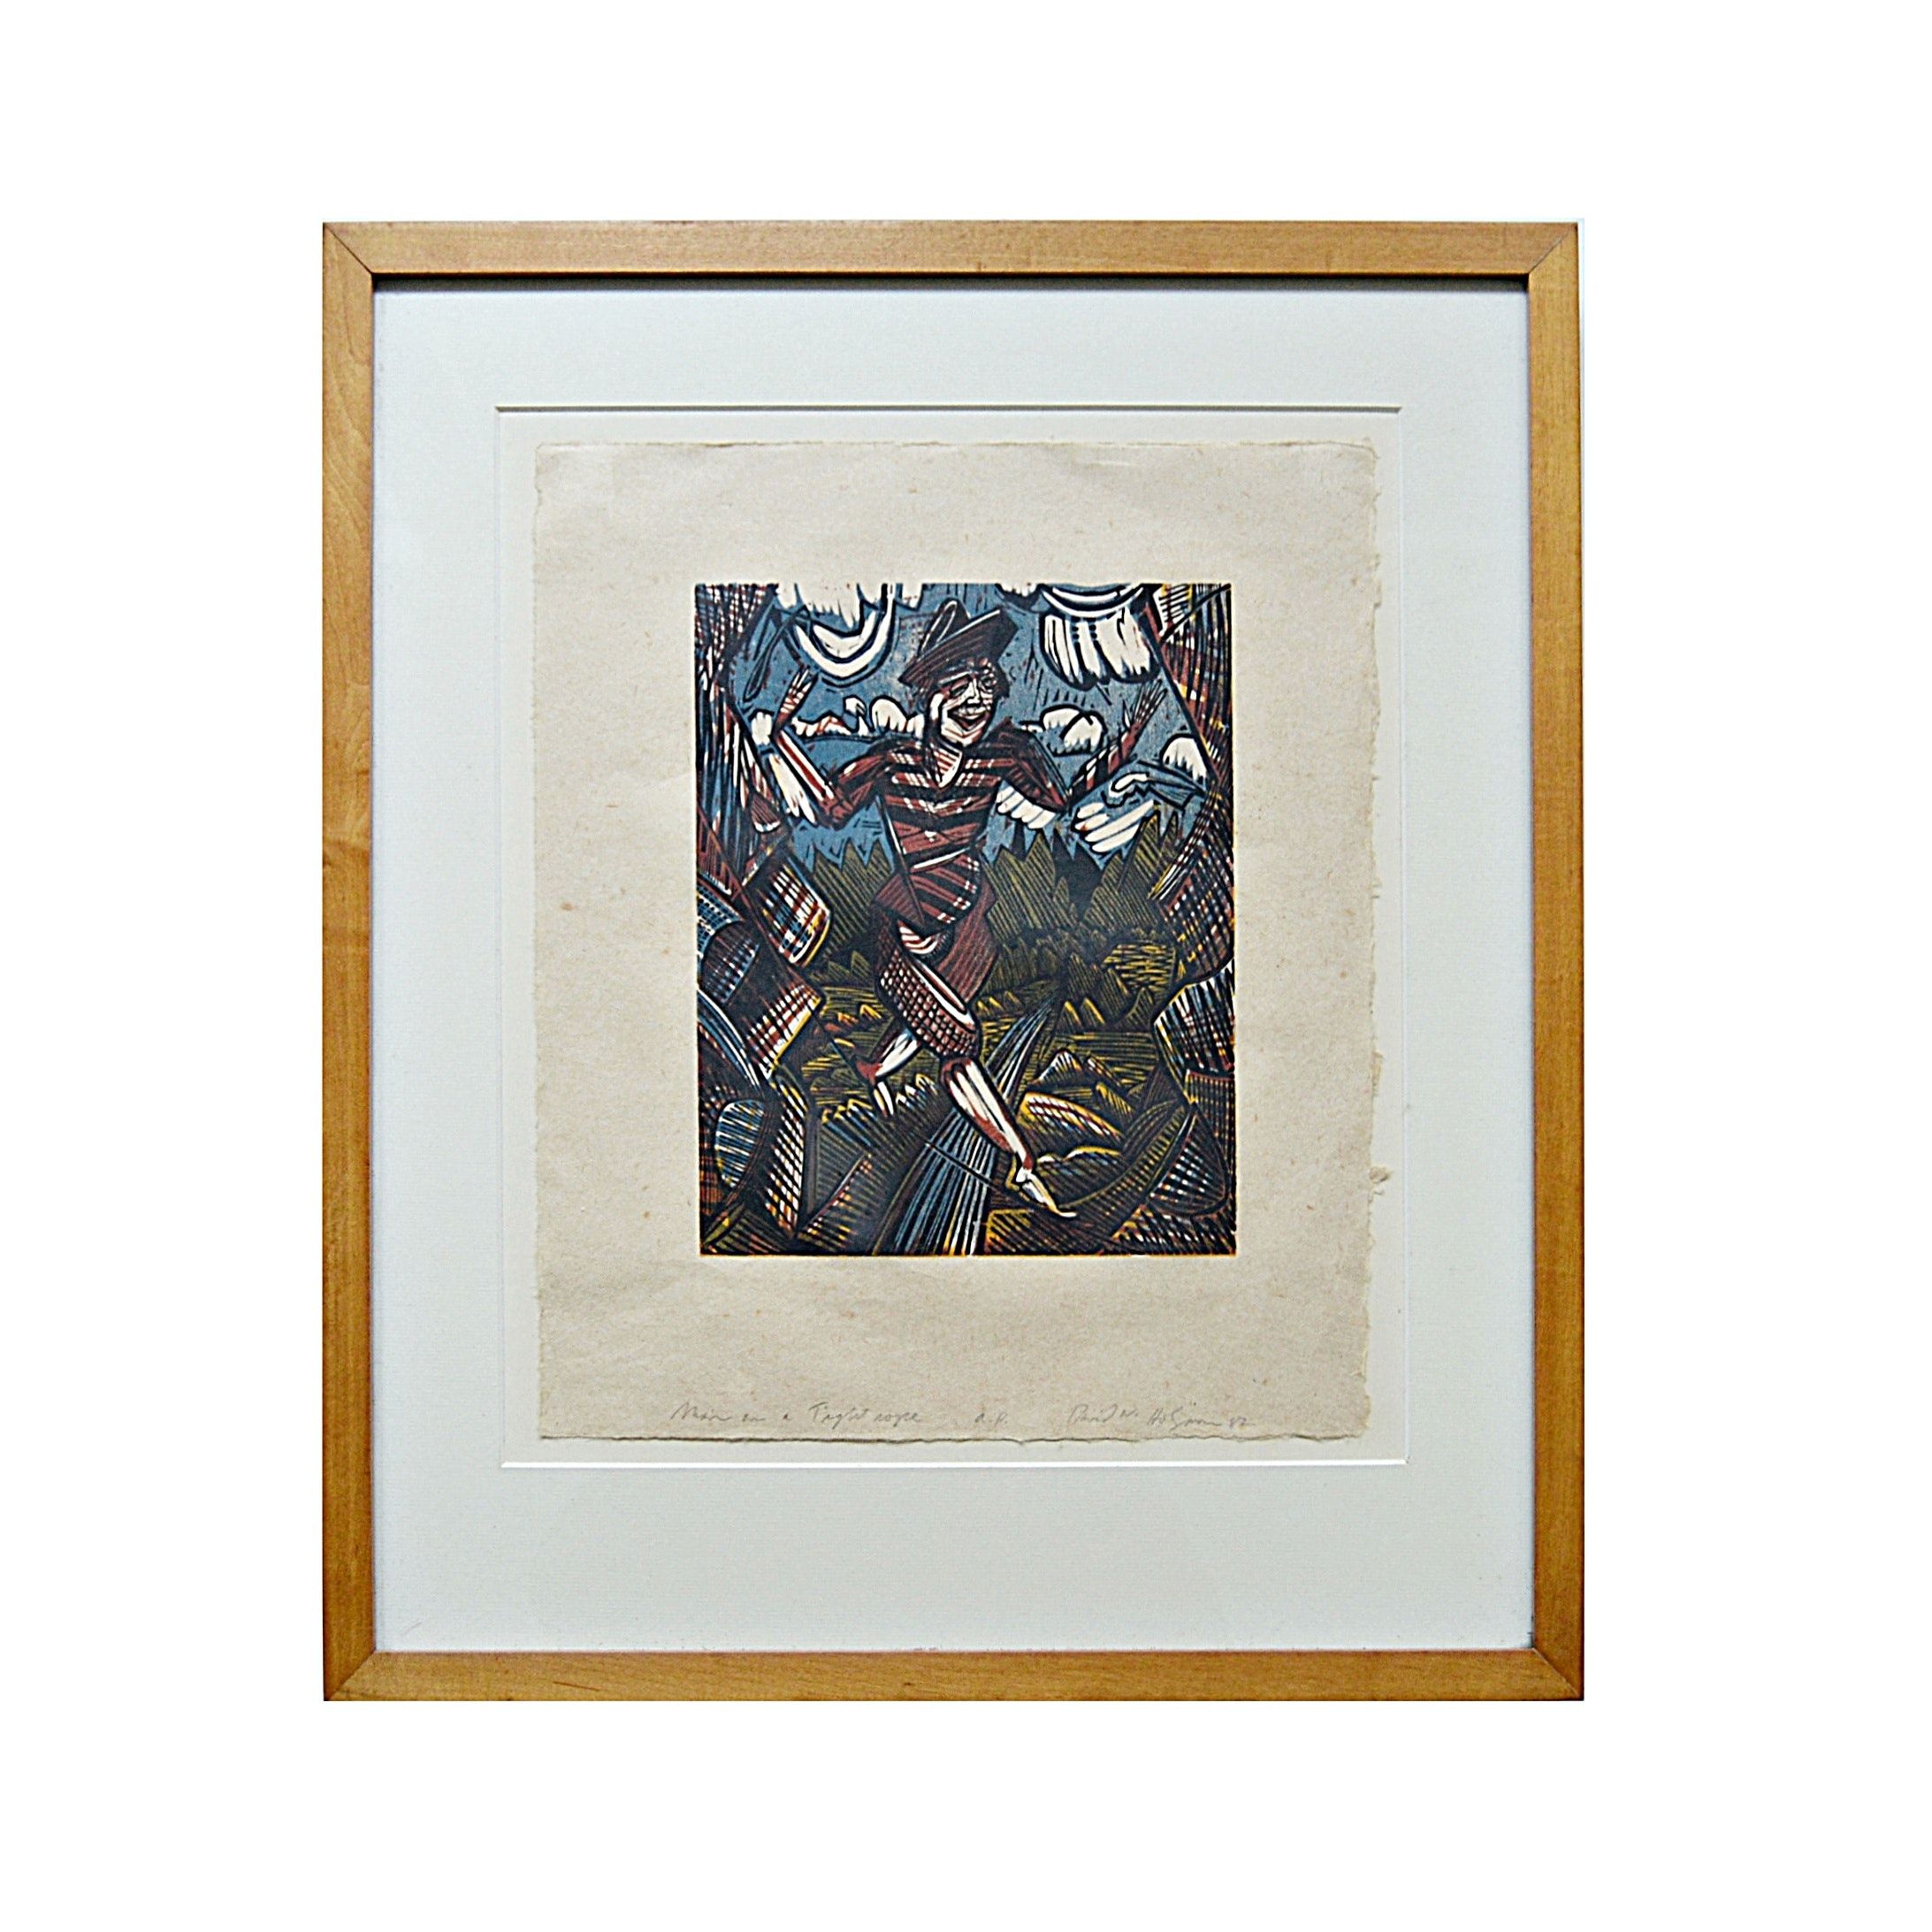 "David Holzman Woodblock Print Titled ""Man on a Tightrope"""